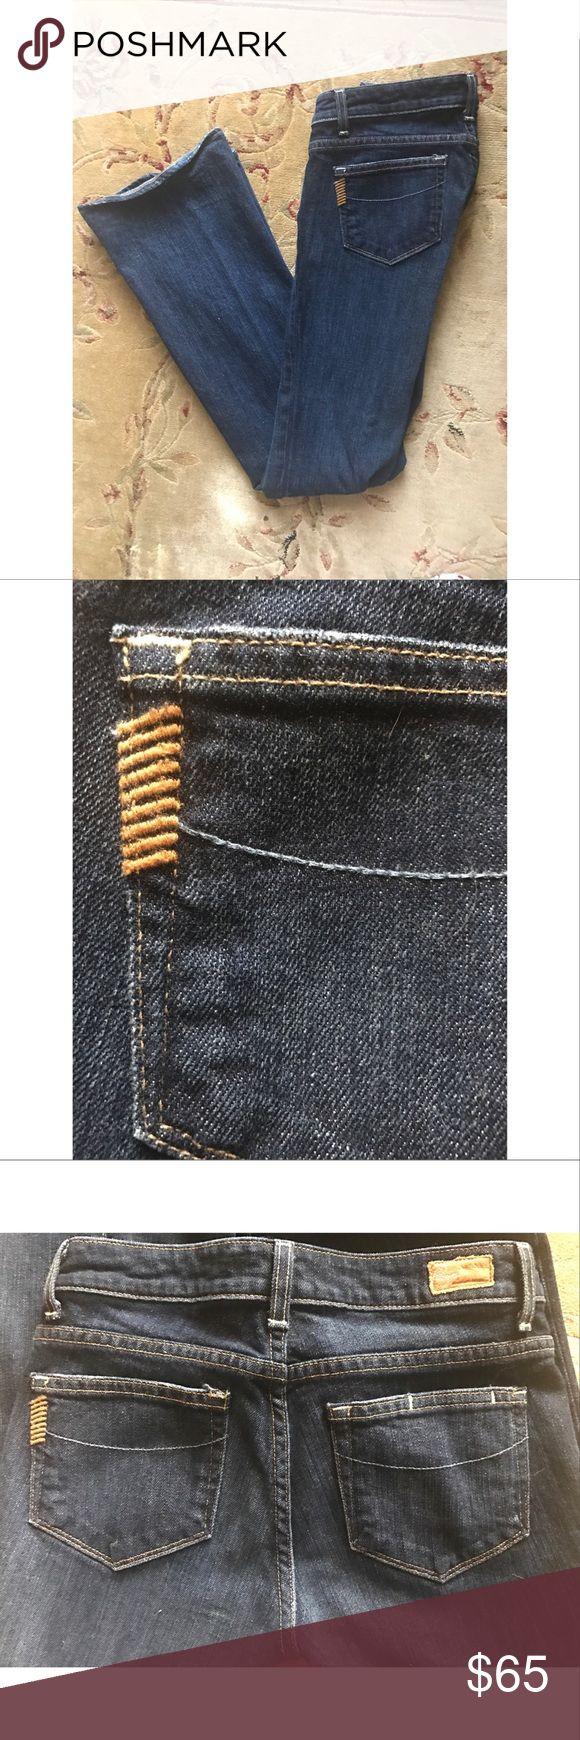 "New Paige Premium Denim Boot Cut Jeans Sz 27 Never worn Paige Premium Denim jeans, Sz 27. 34"" inseam, 9"" diameter bootcut. Paige Jeans Jeans Boot Cut"